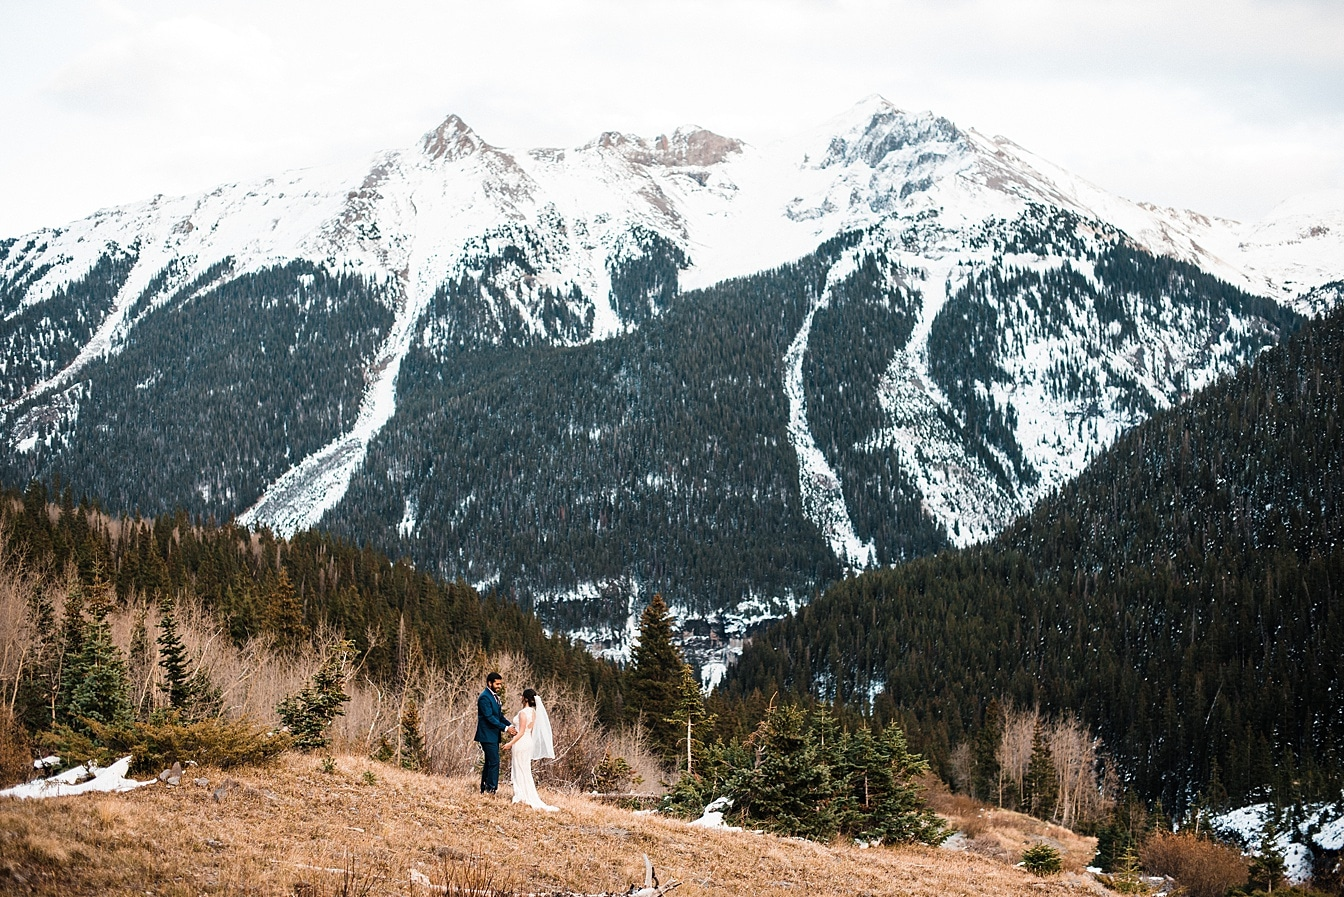 Colorado-Mountain-Elopement-Meredith-Humayun_0004.jpg